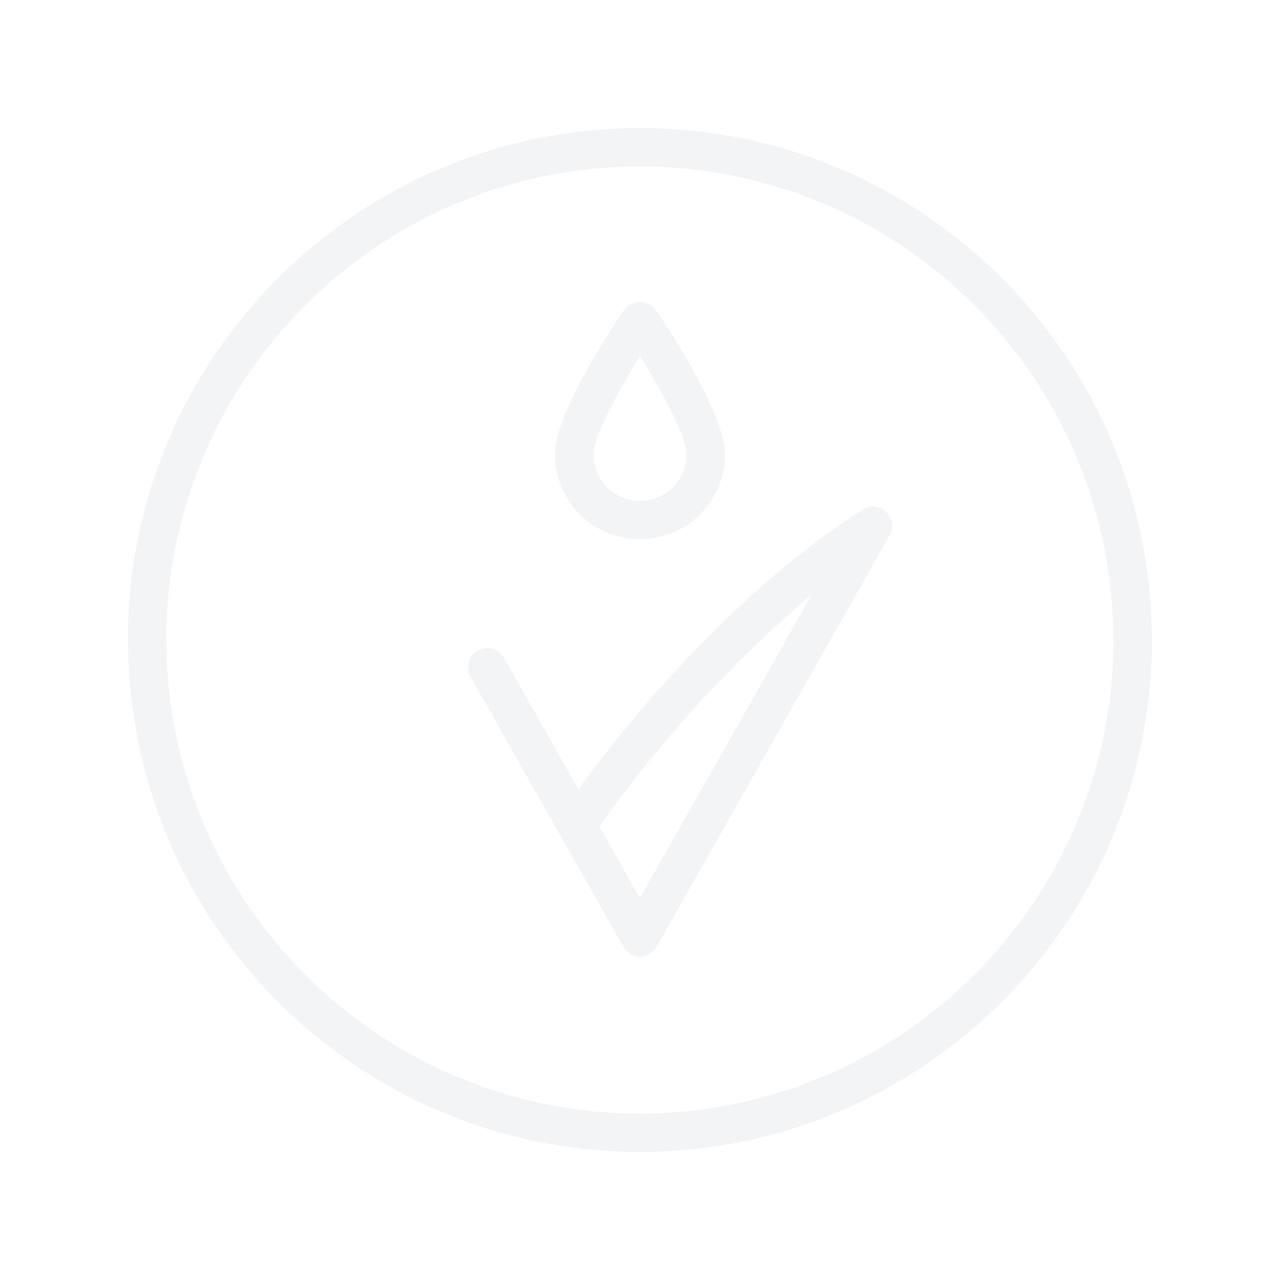 MANCAVE Eucalyptus Deodorant 75ml